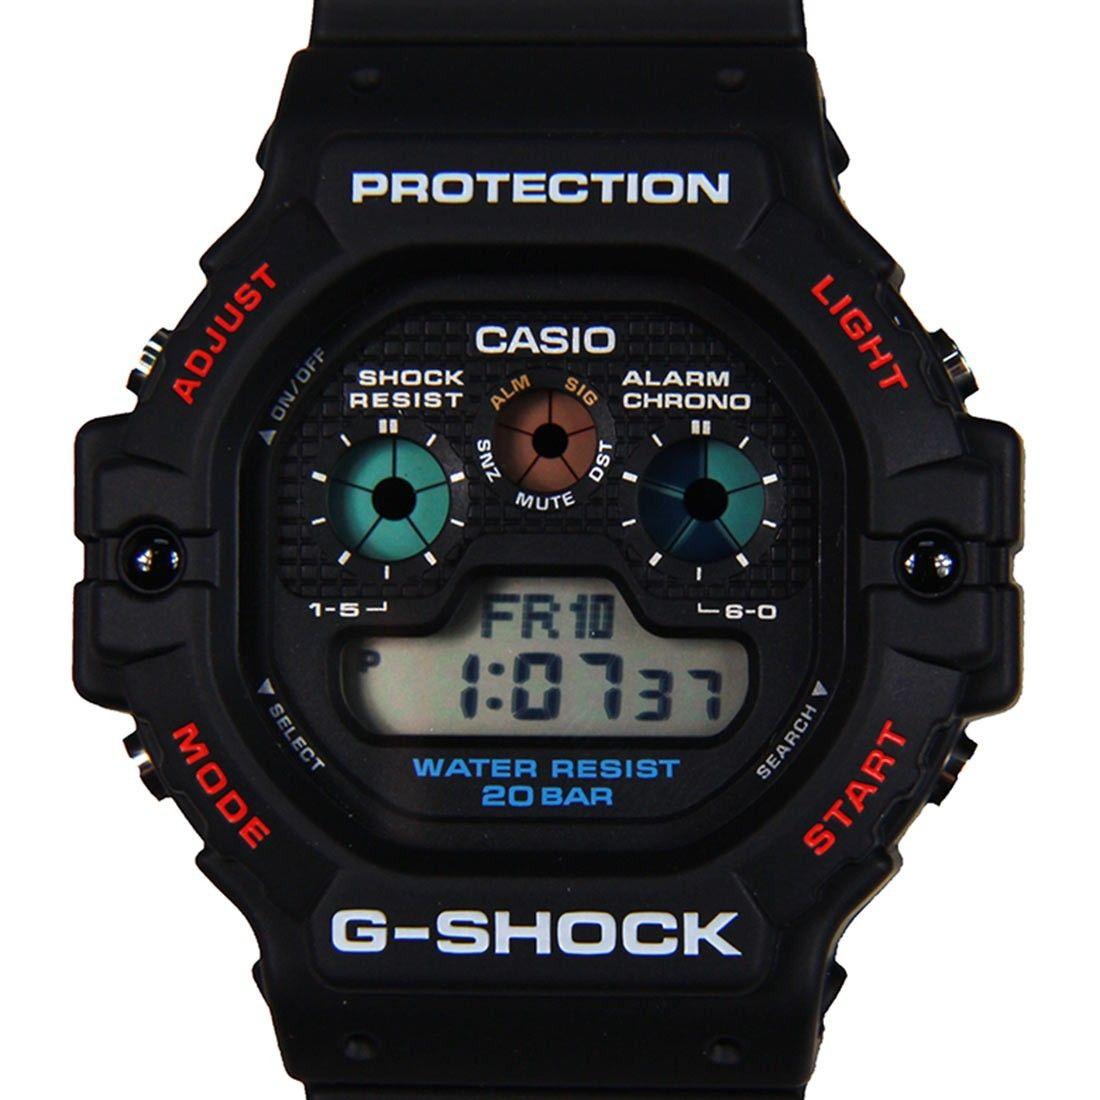 Casio G-Shock Sports Watch DW-5900-1D DW-5900-1 #sportswatches